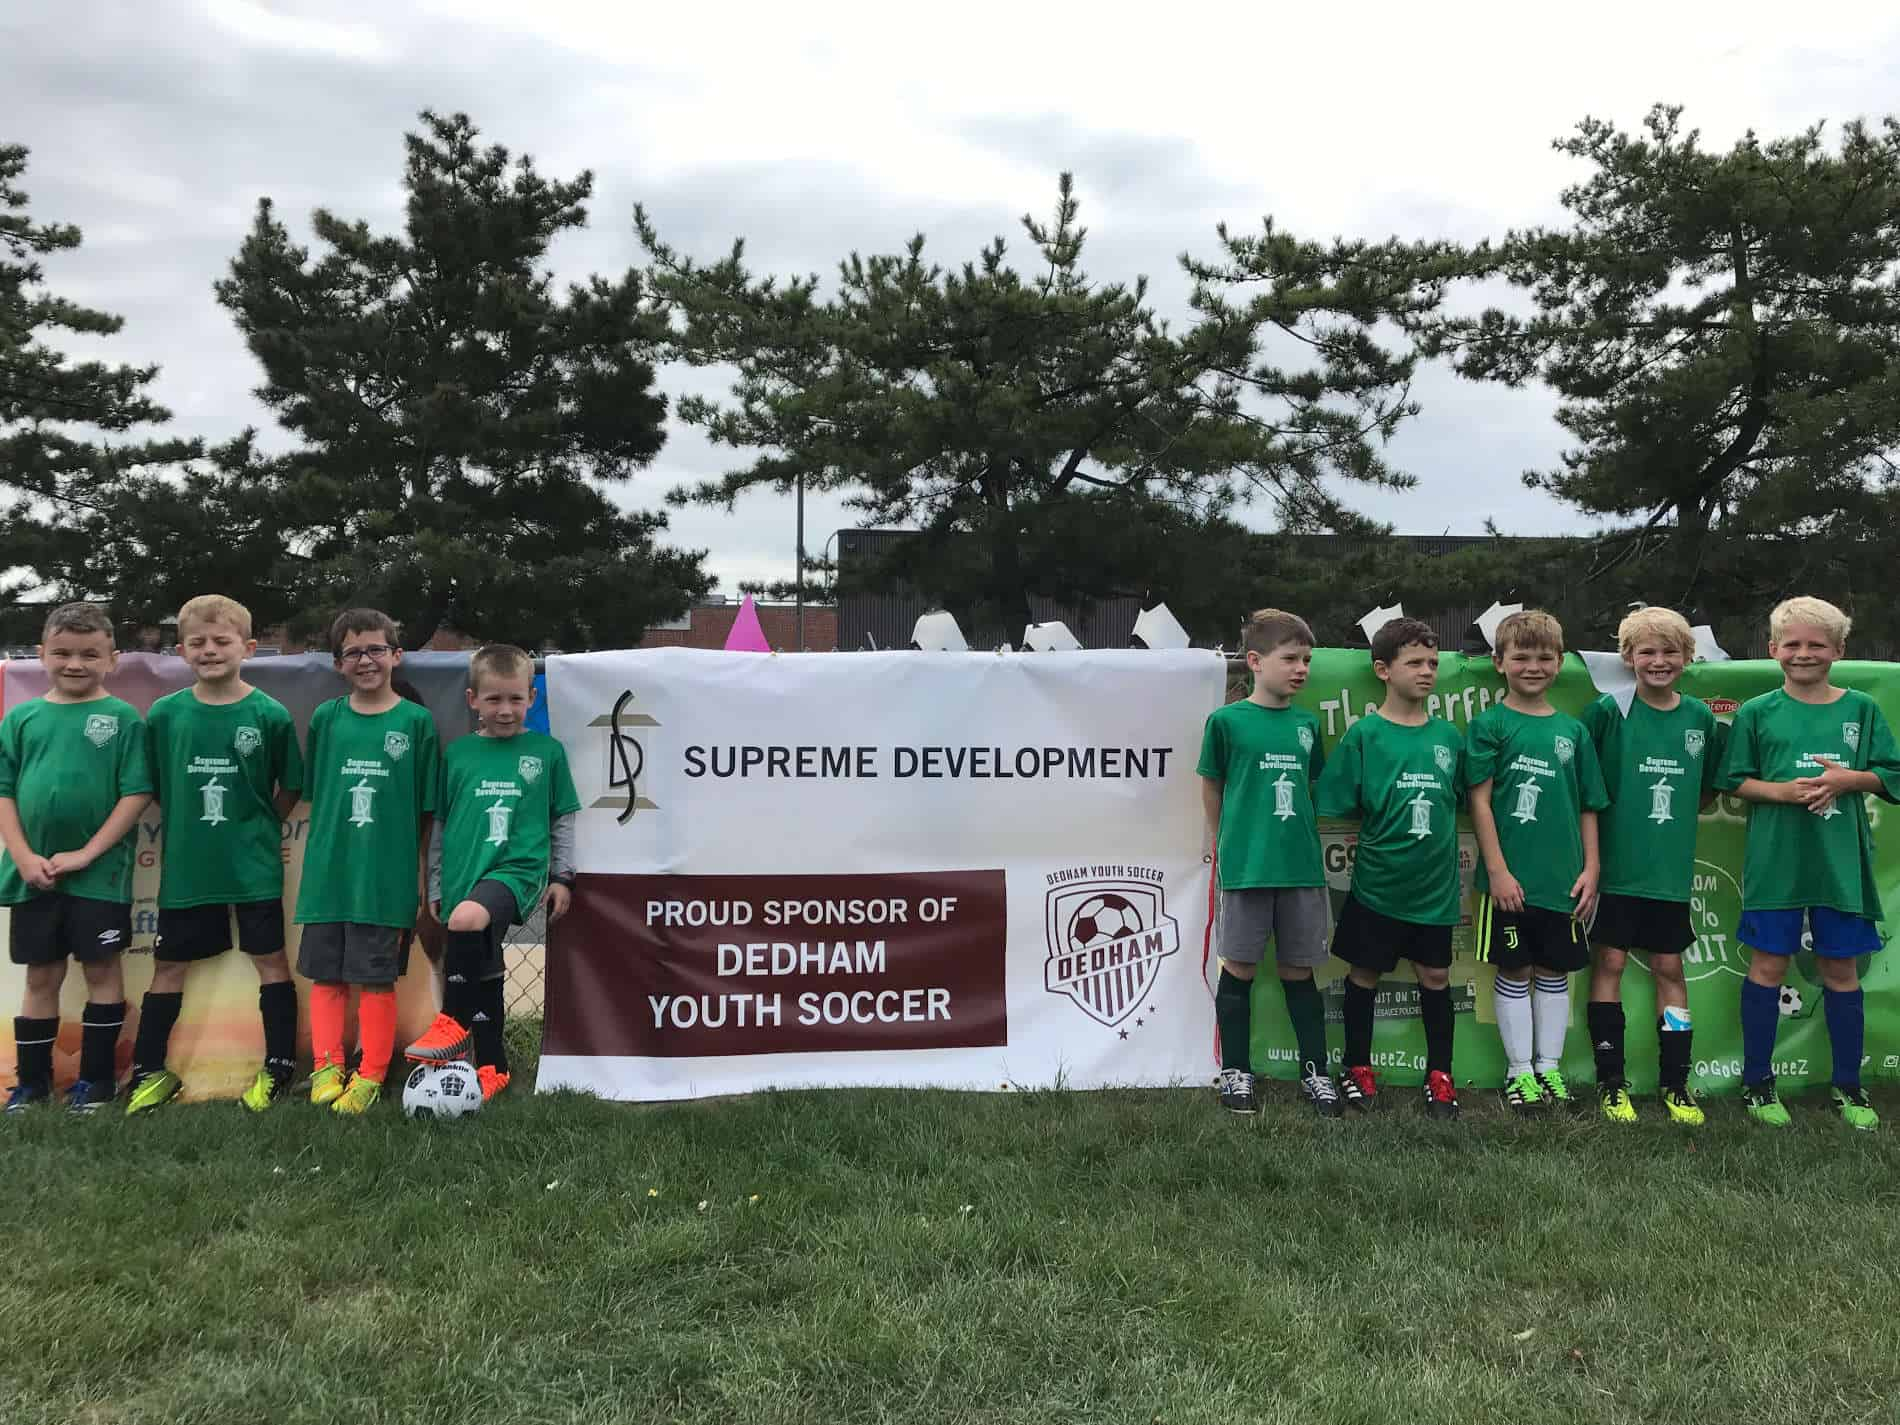 Supreme Development soccer team